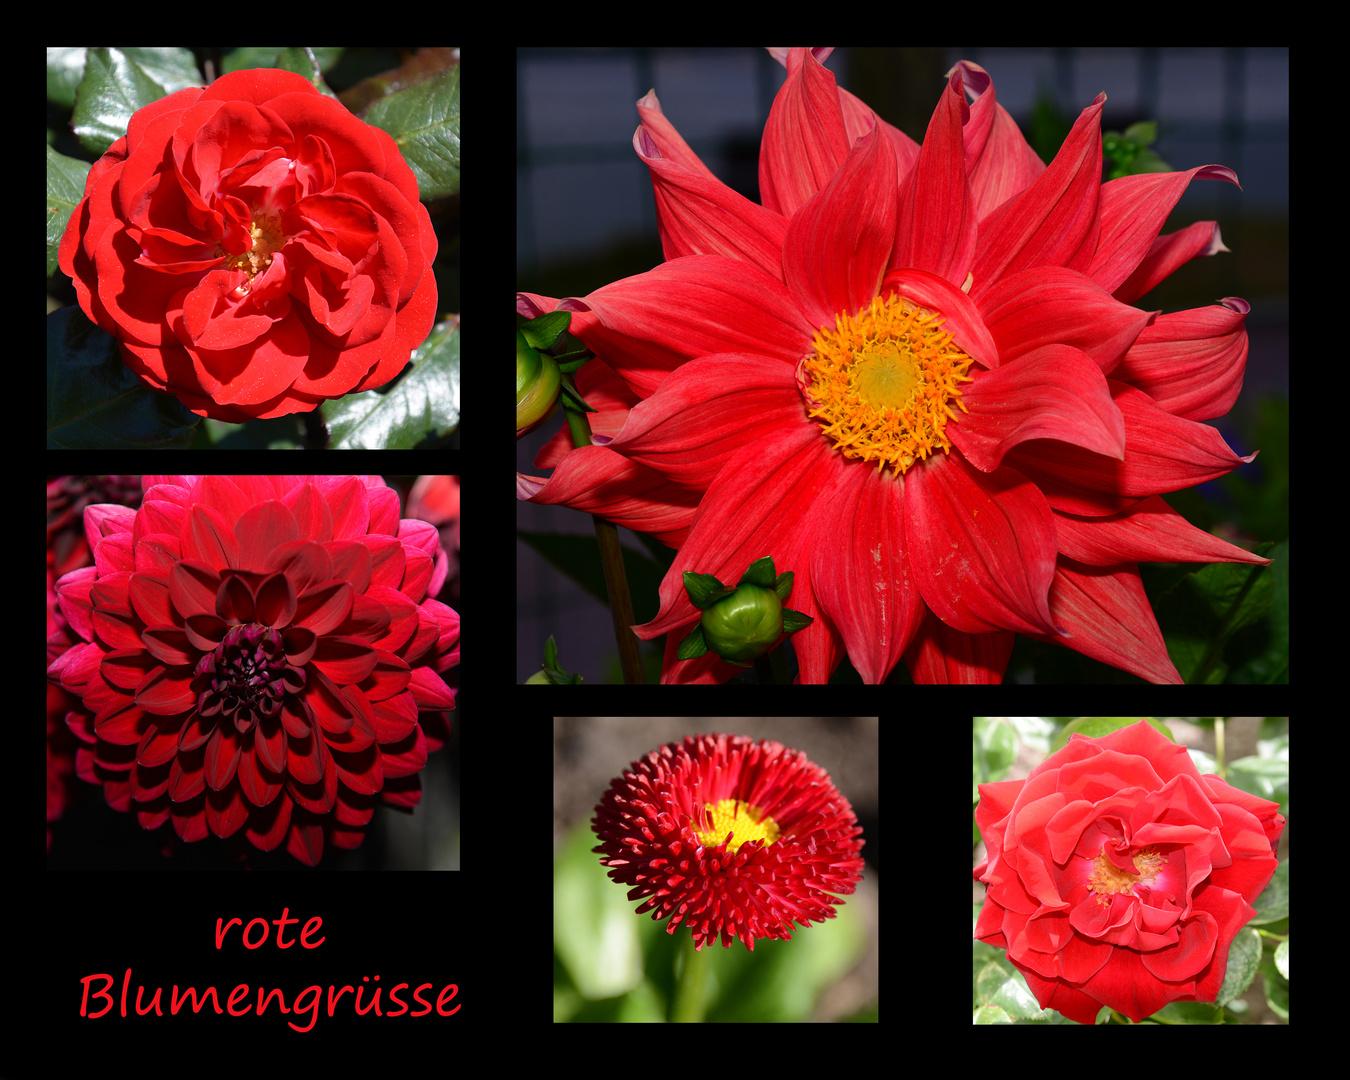 rote Blumengrüsse